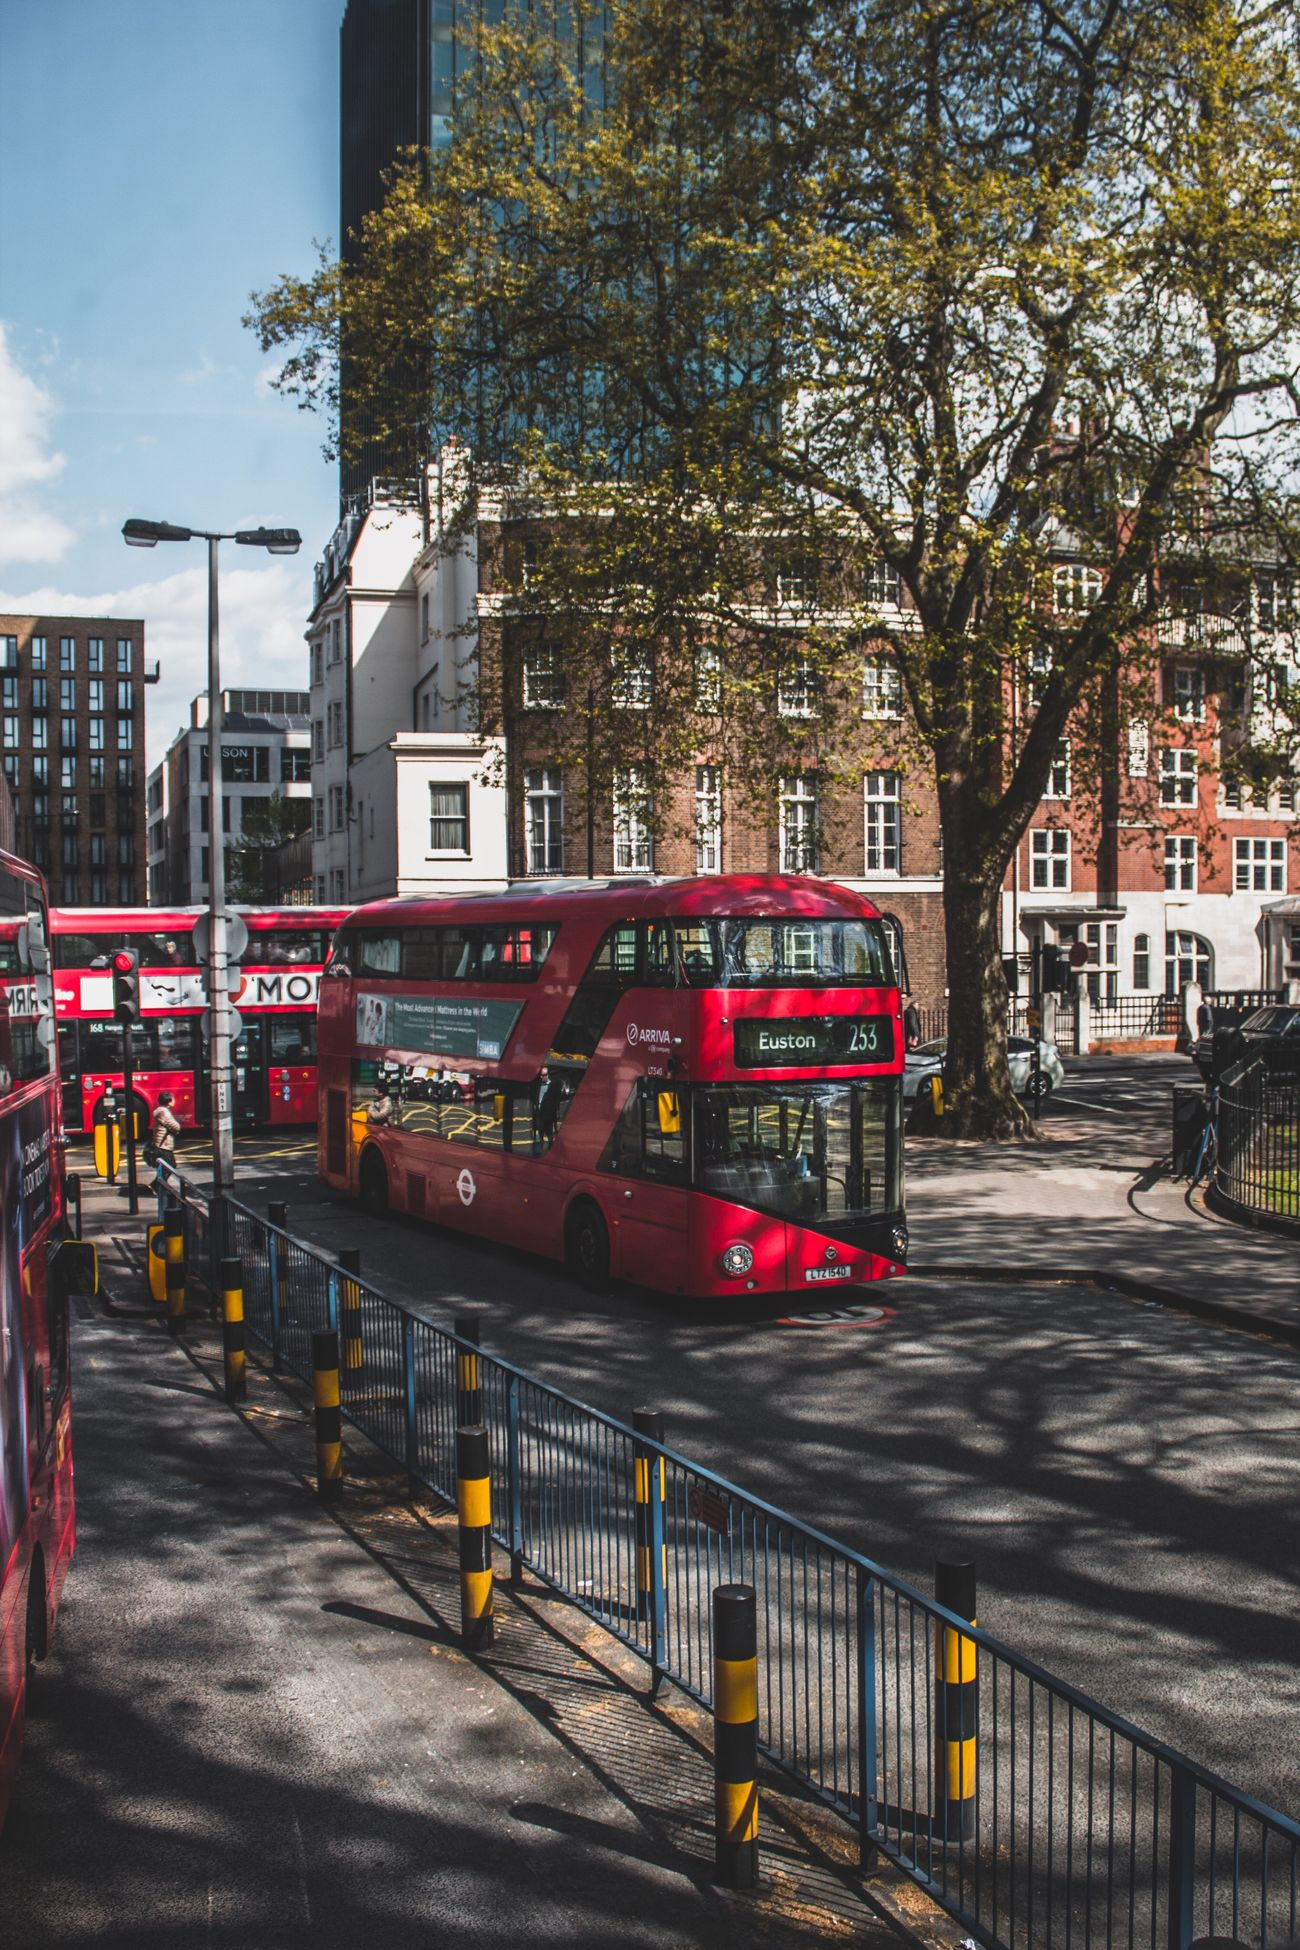 London United Kingdom London Bus City City Life Cityscape city Transportation Red Double-decker Bus City Neighborhood Map